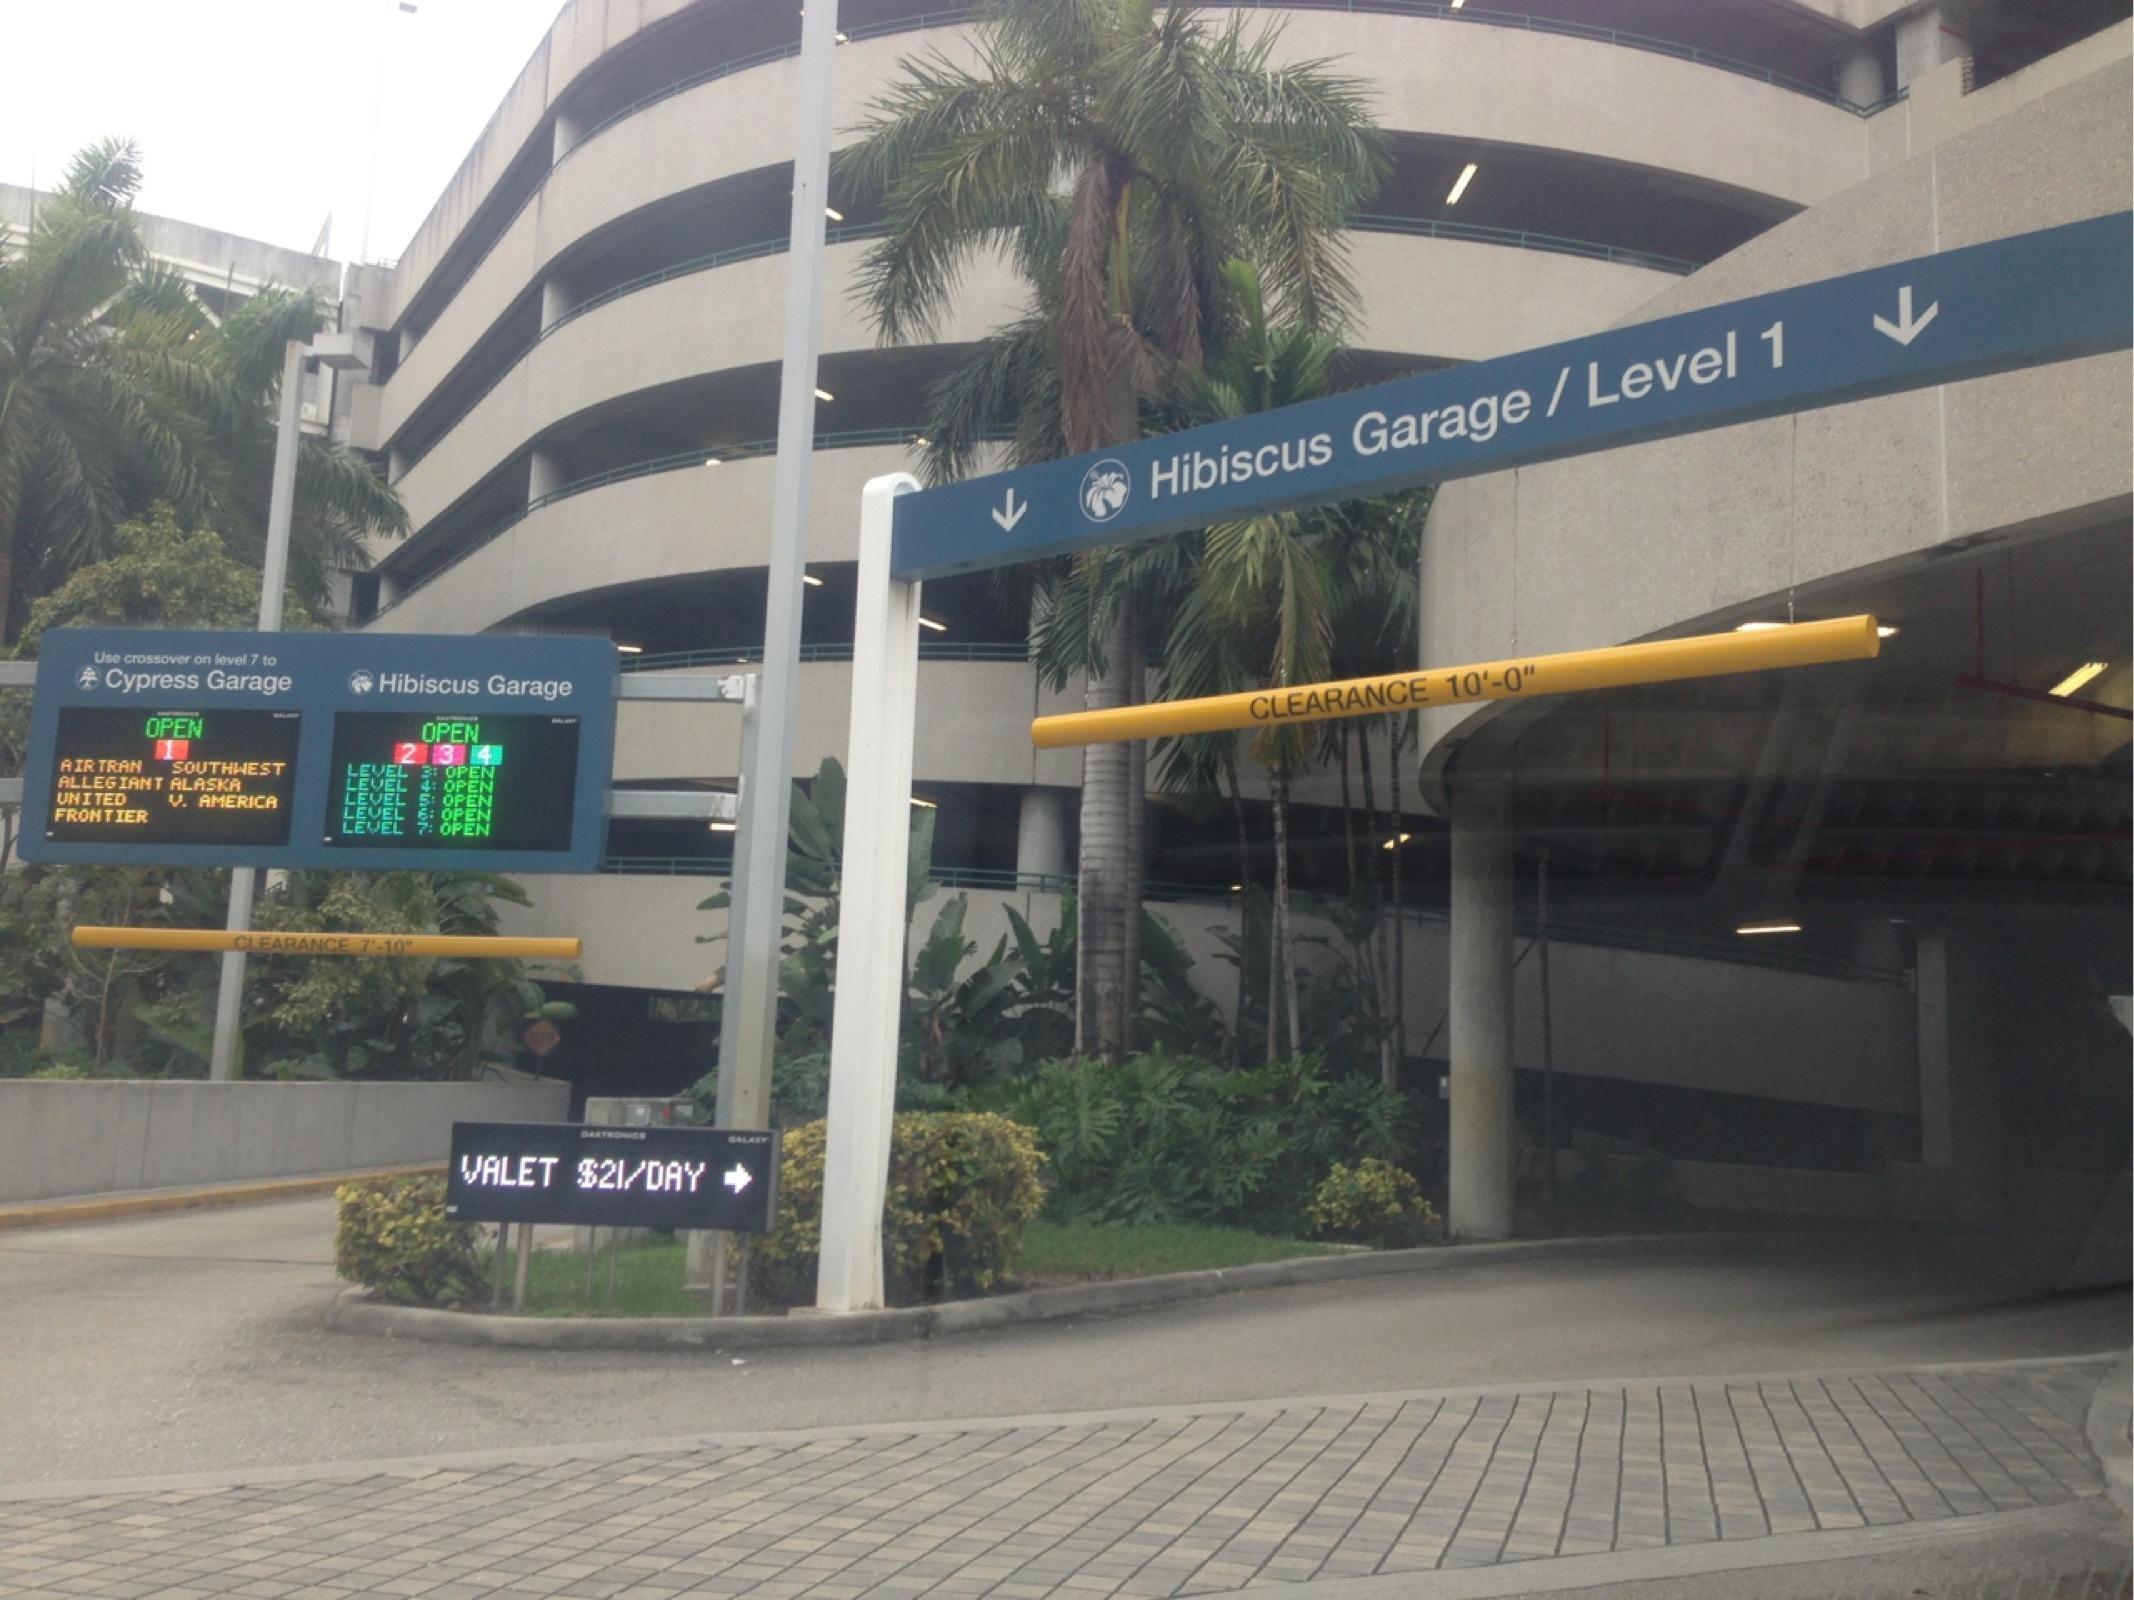 Fll Hibiscus Garage Hourly Parking Parking In Fort